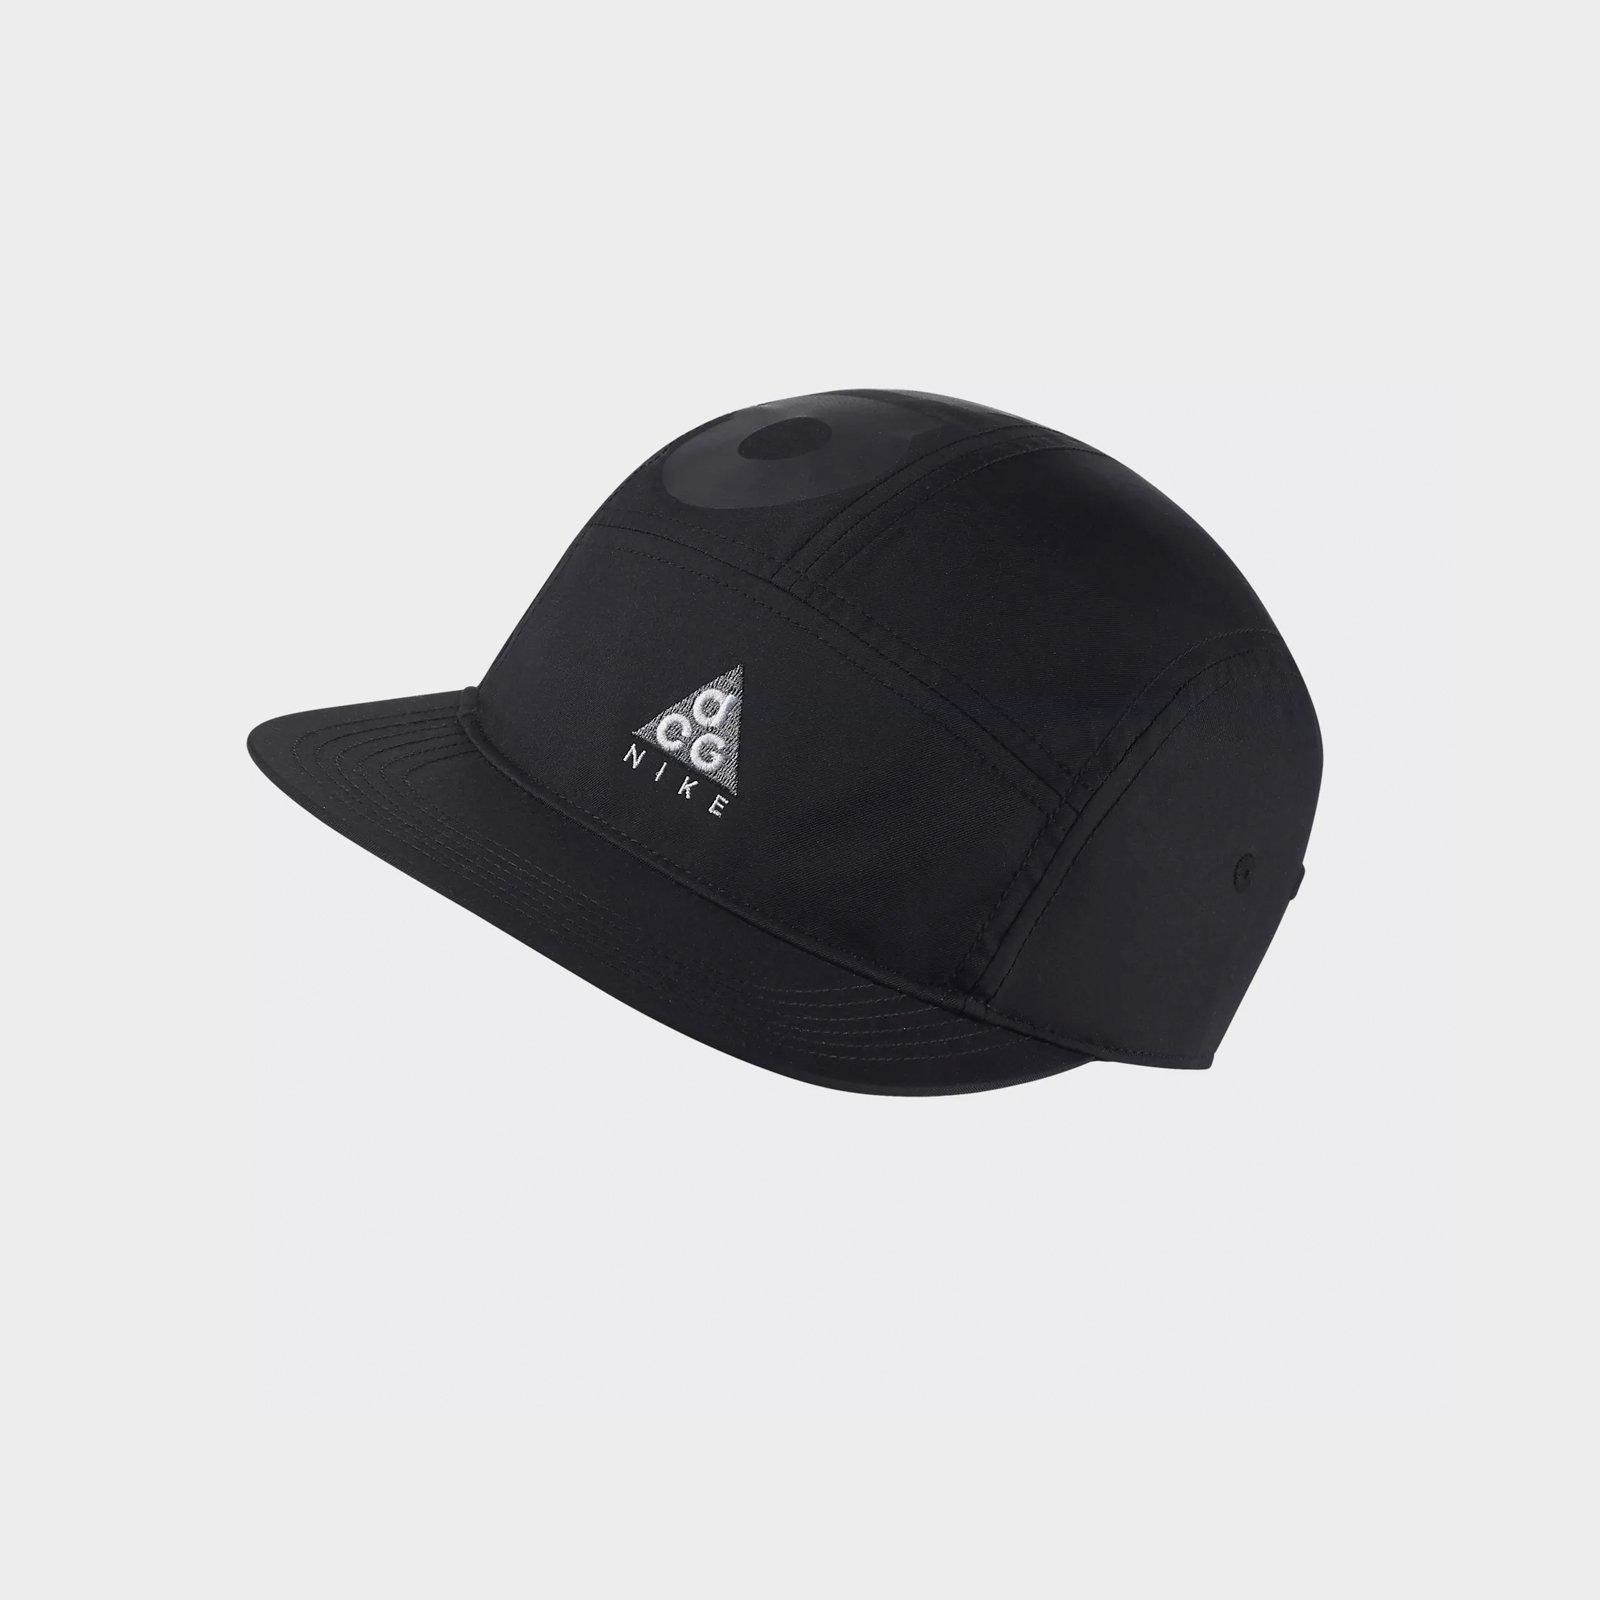 Nike Dry AW84 Cap ACG QS - Ao2104-010 - Sneakersnstuff ... 71240ac533c